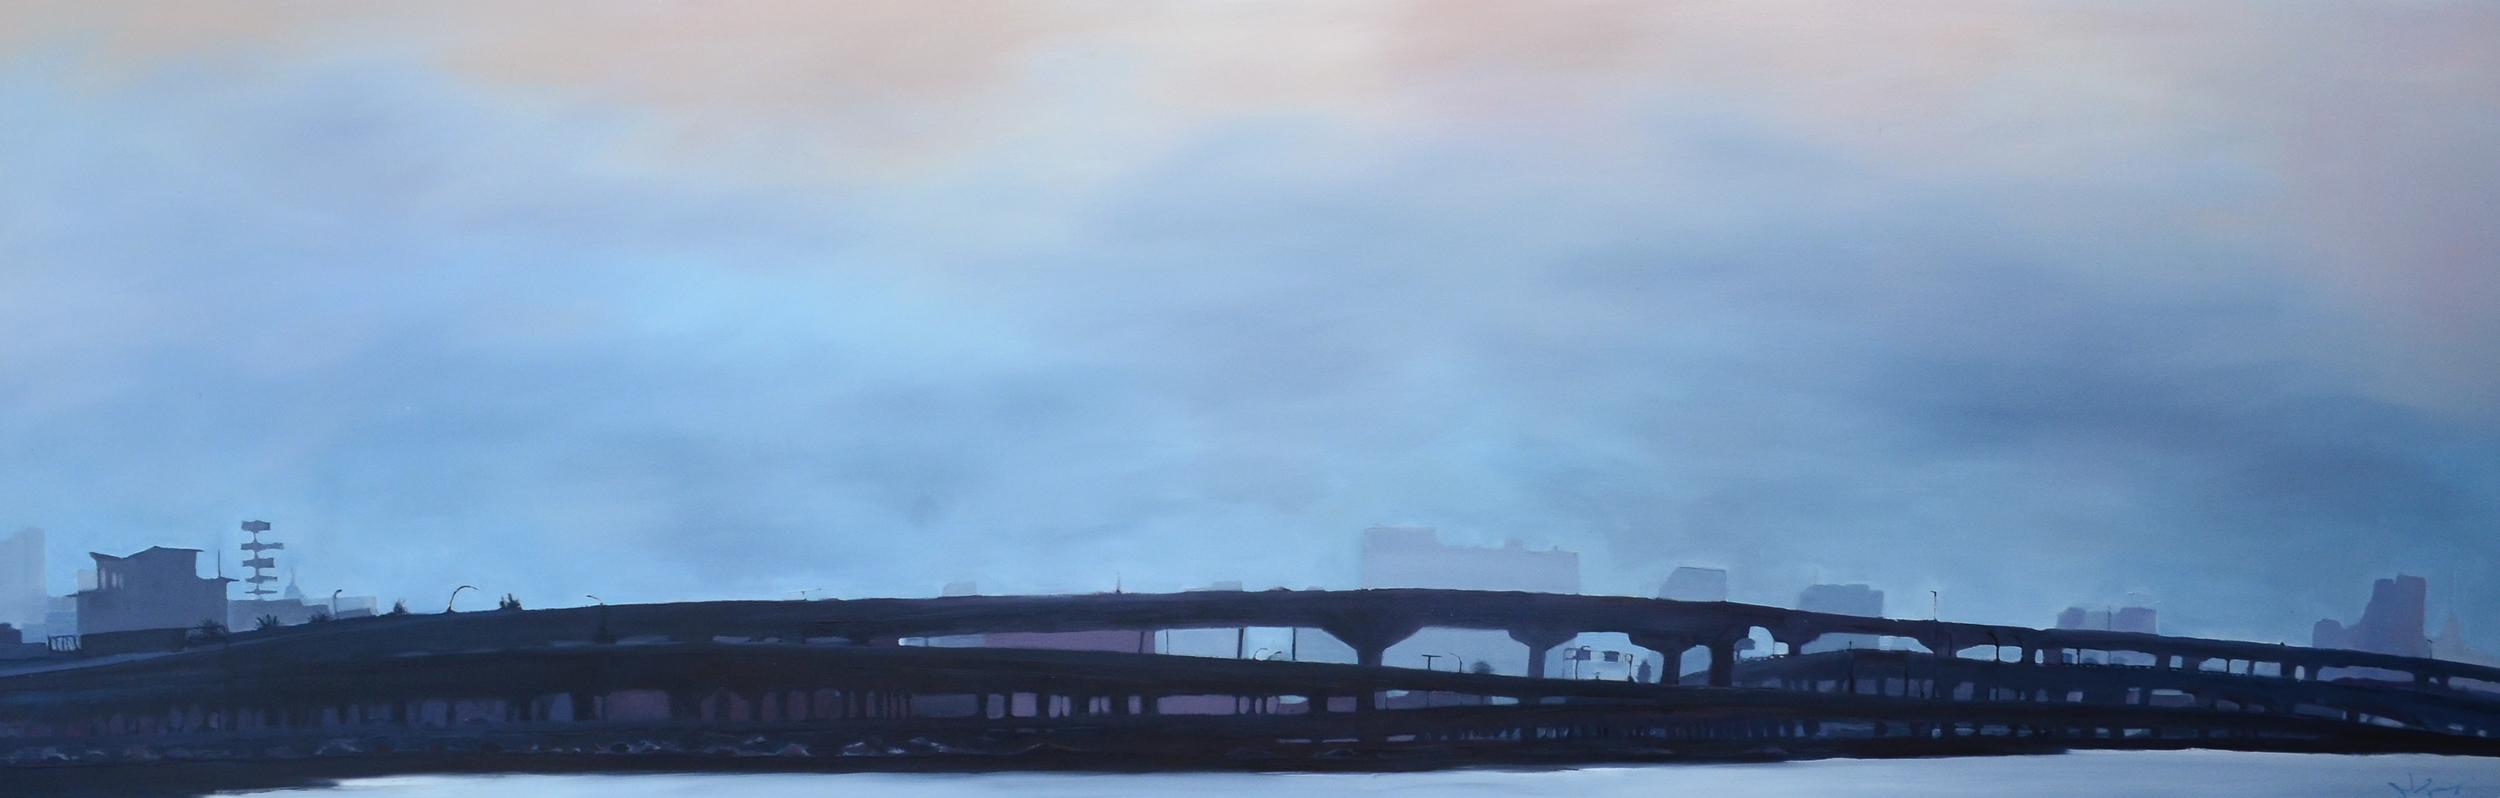 Emeryville Overpasses